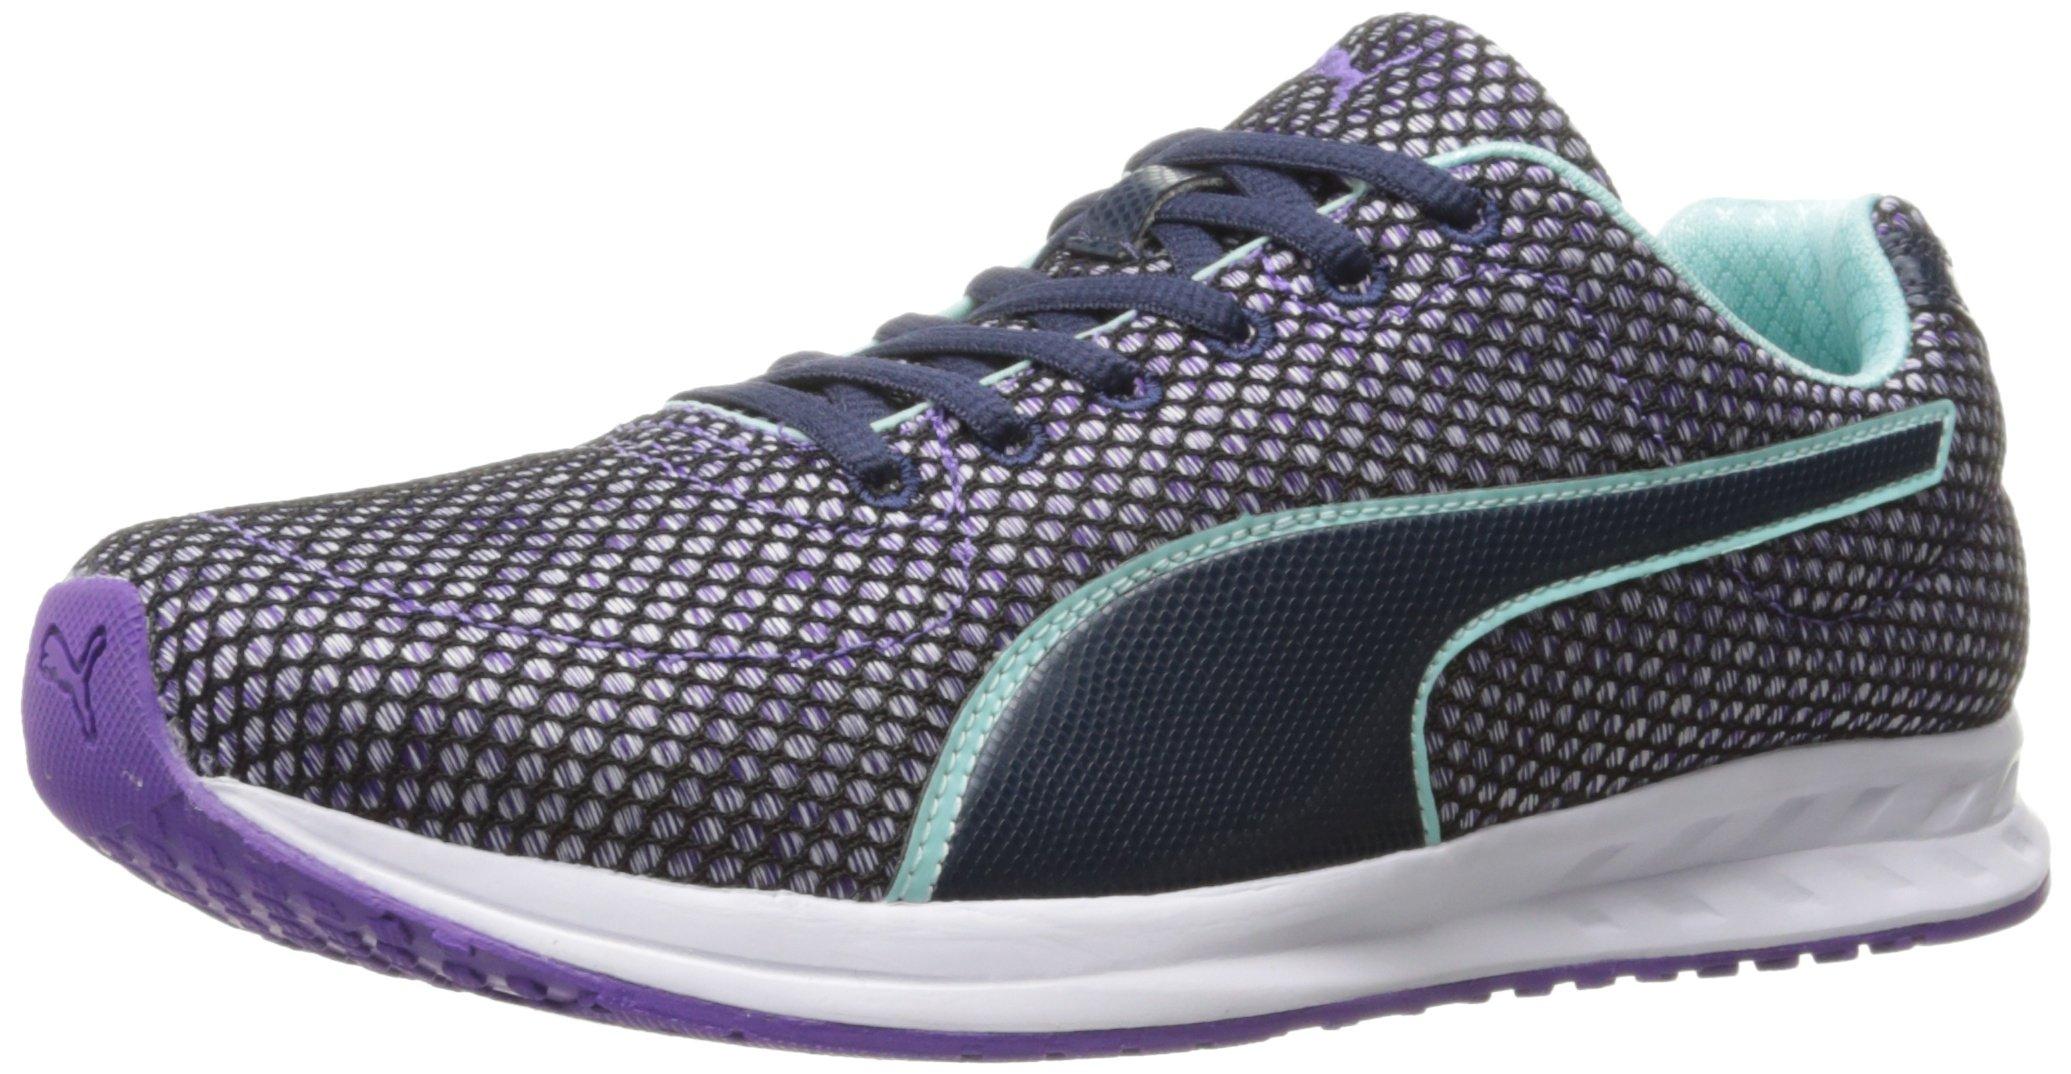 PUMA Women's Burst TECH WN's Cross-Trainer Shoe, Royal Purple-Aruba Blue-Peacoat, 9 M US by PUMA (Image #1)